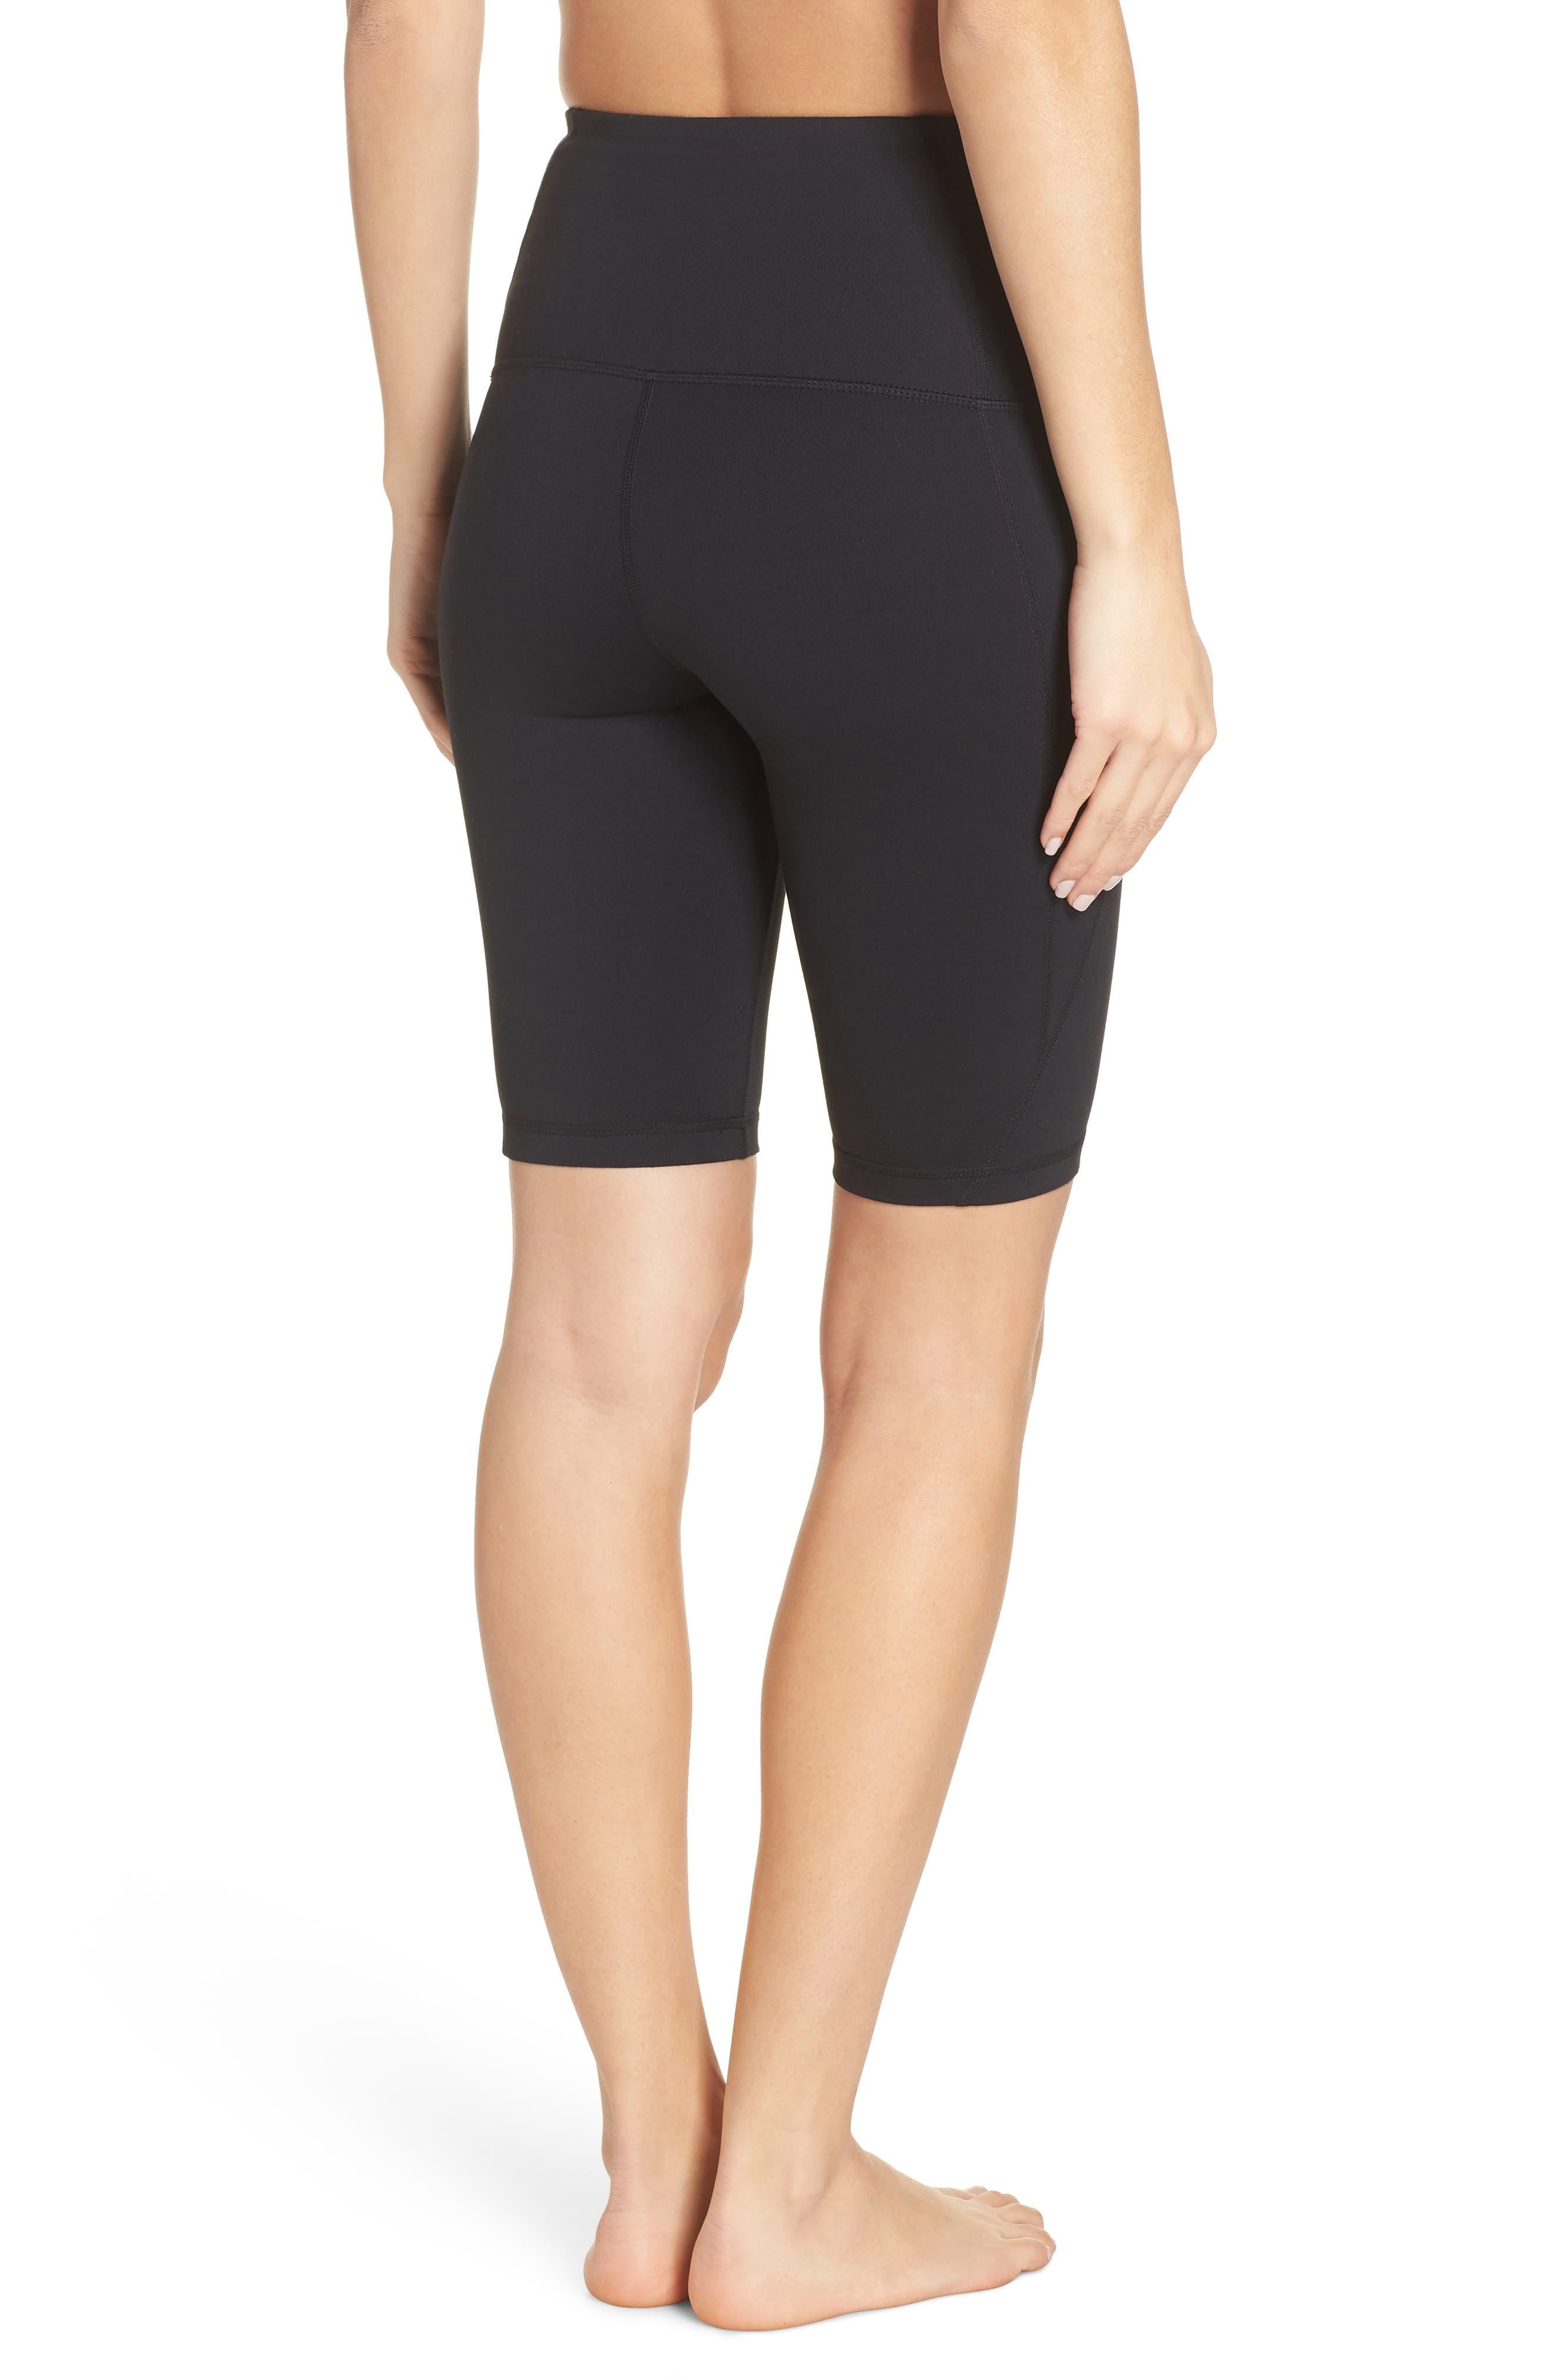 ZELLA, Hatha High Waist Bike Shorts, Alternate thumbnail 2, color, BLACK